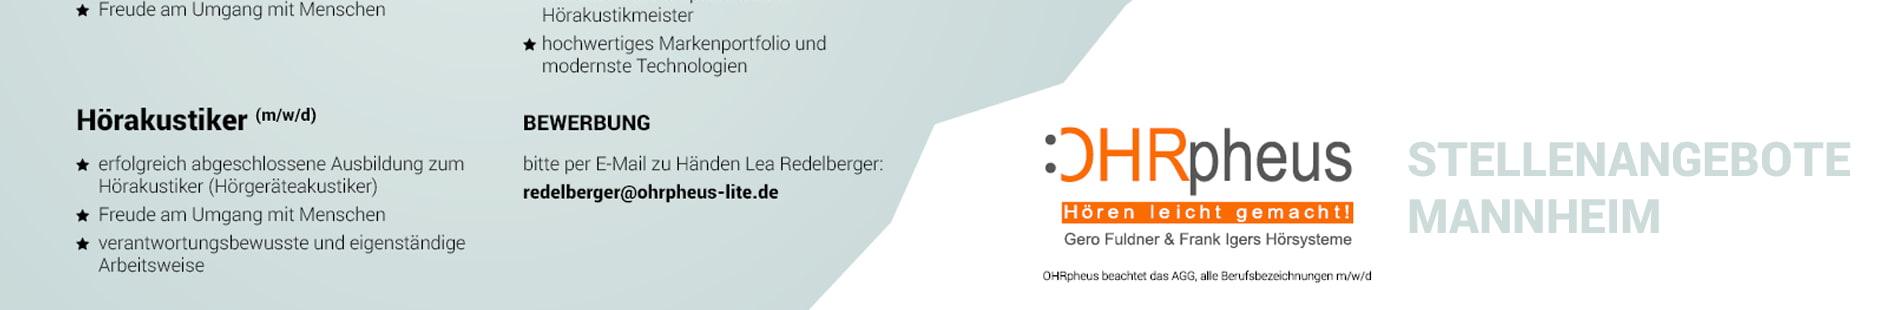 OHRpheus Hörgeräte Stellenangebote Filiale Mannheim Q 6 Q 7 Sliderbild